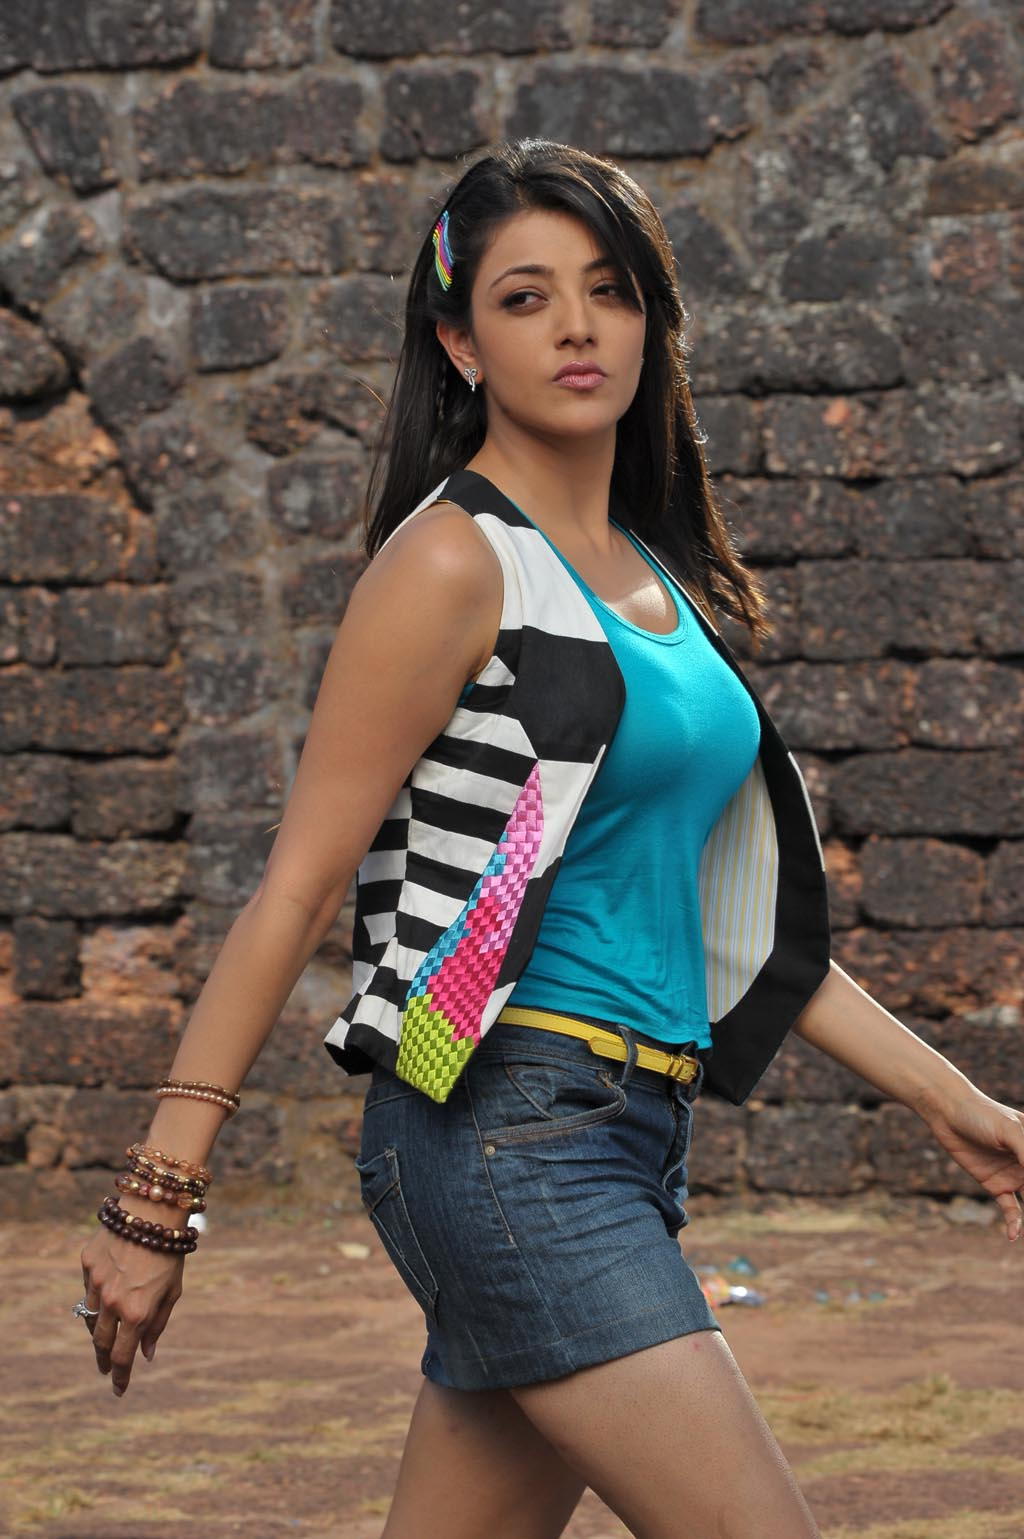 Actress Kajal Agarwal Hot,Businessman Telugu Movie Heroine -3878